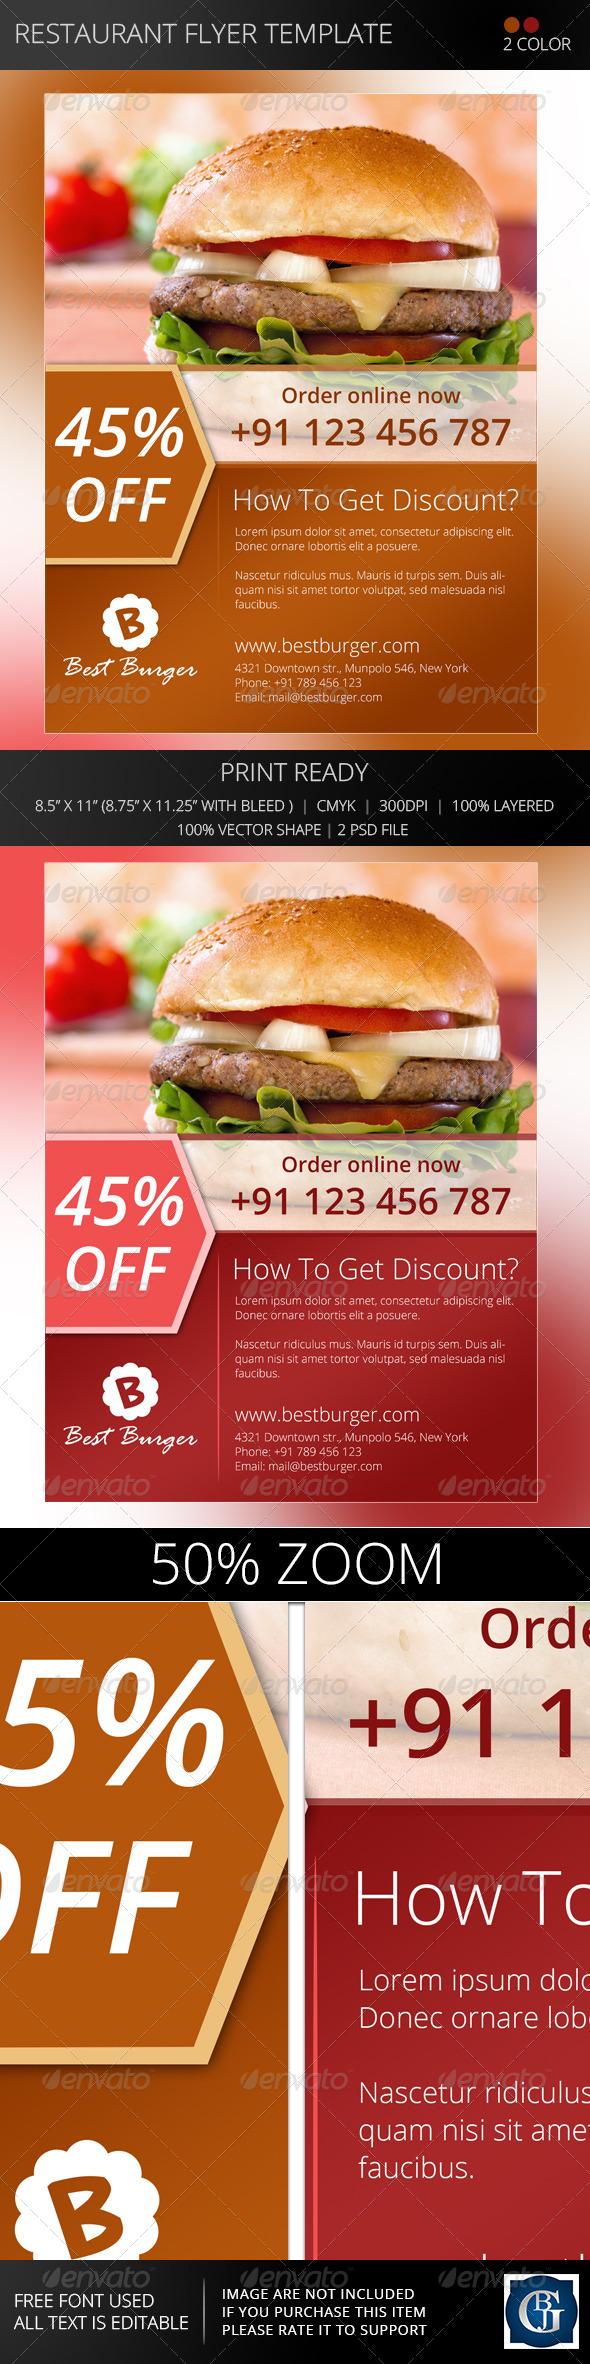 GraphicRiver Restaurant Flyer Template V 01 5648597